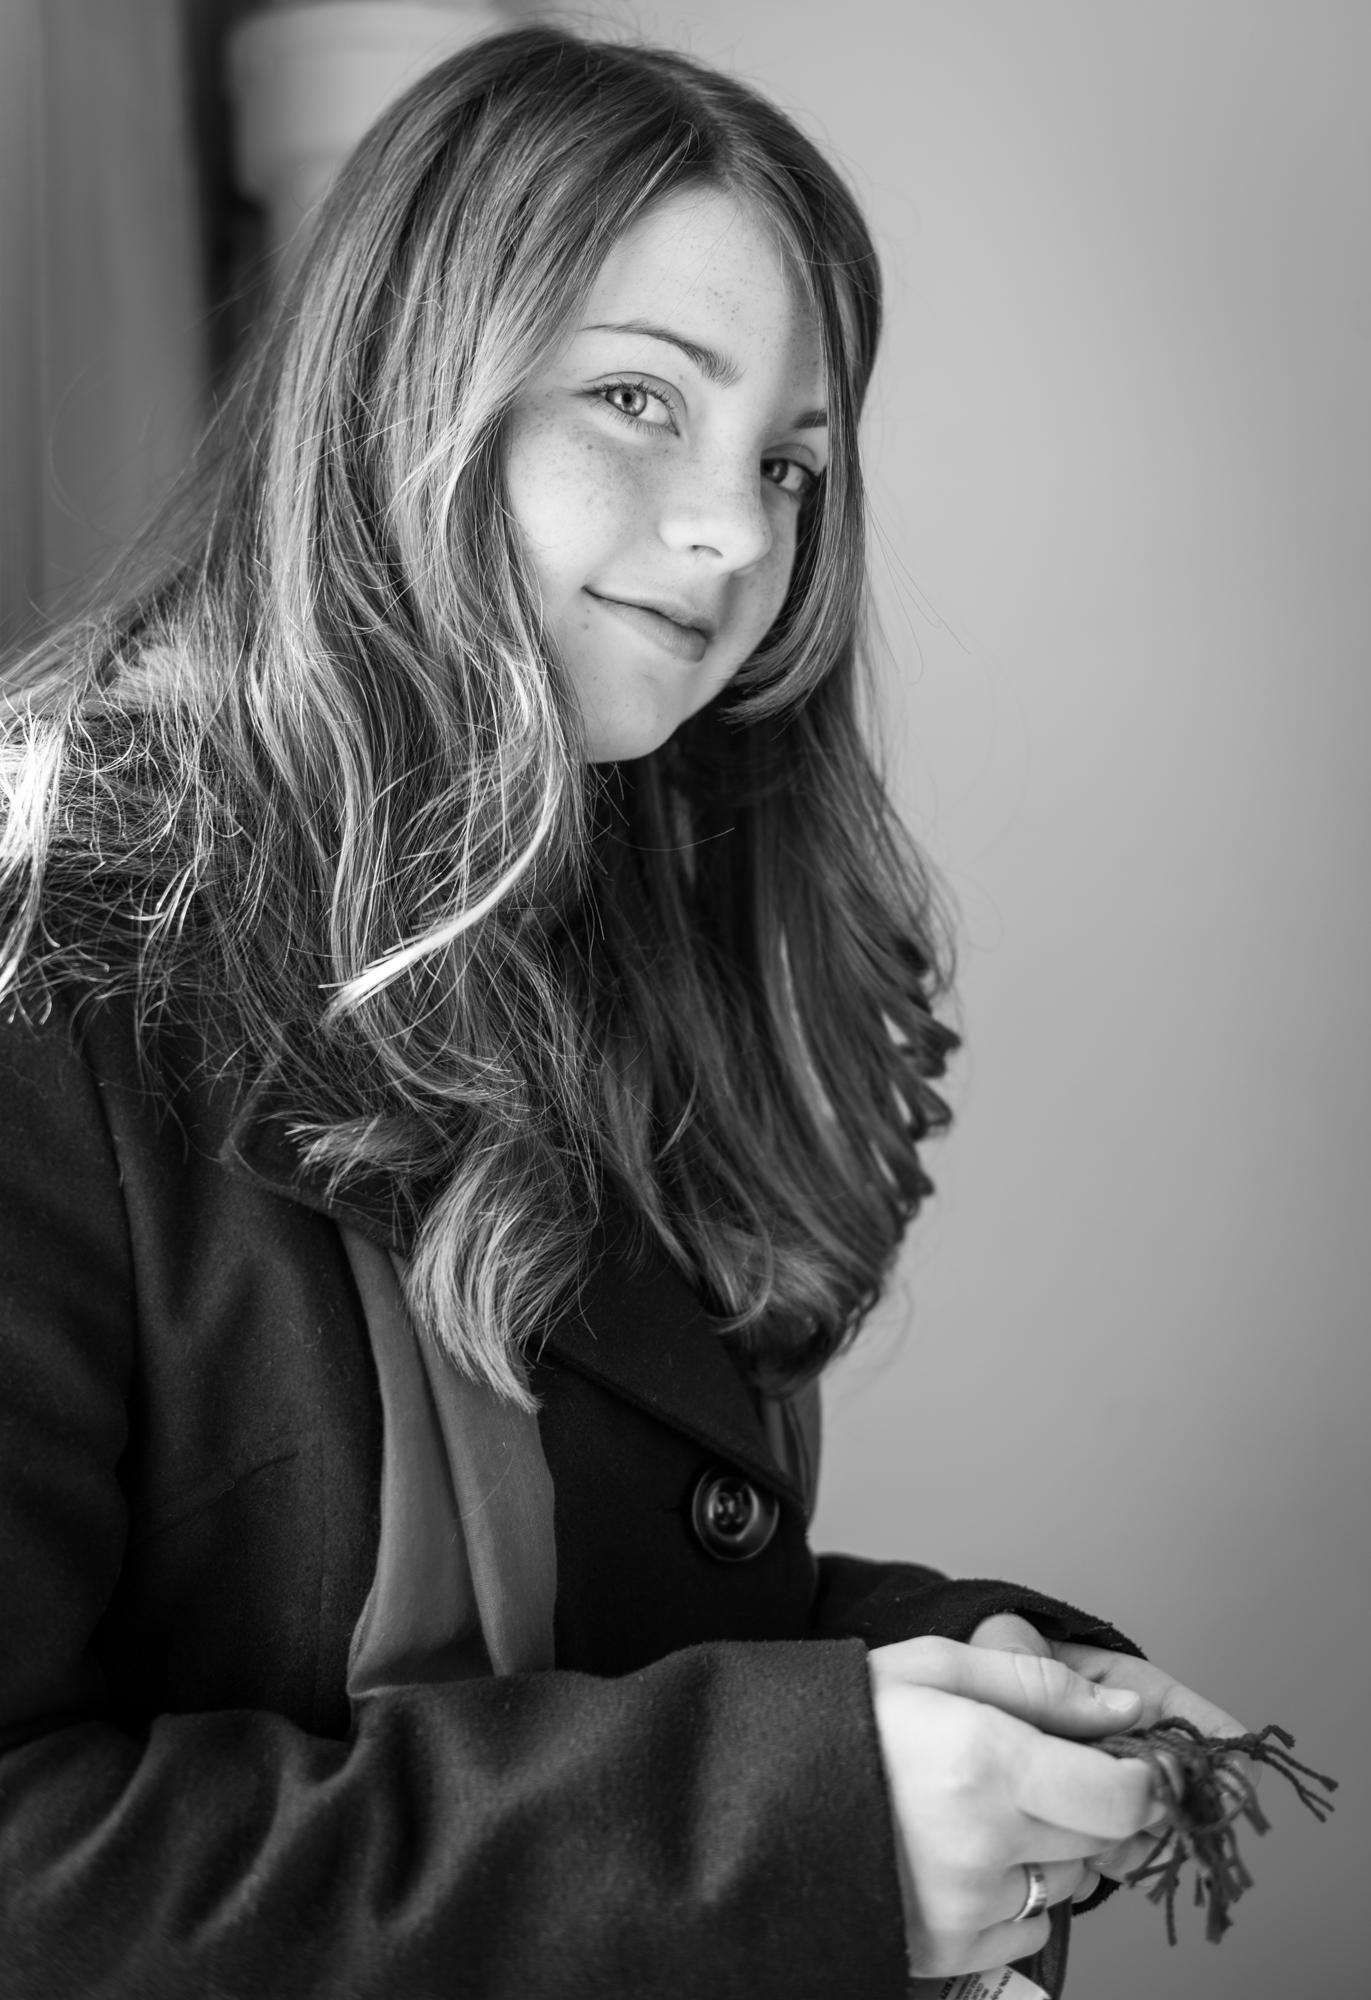 RPena_Portraiture_022.jpg